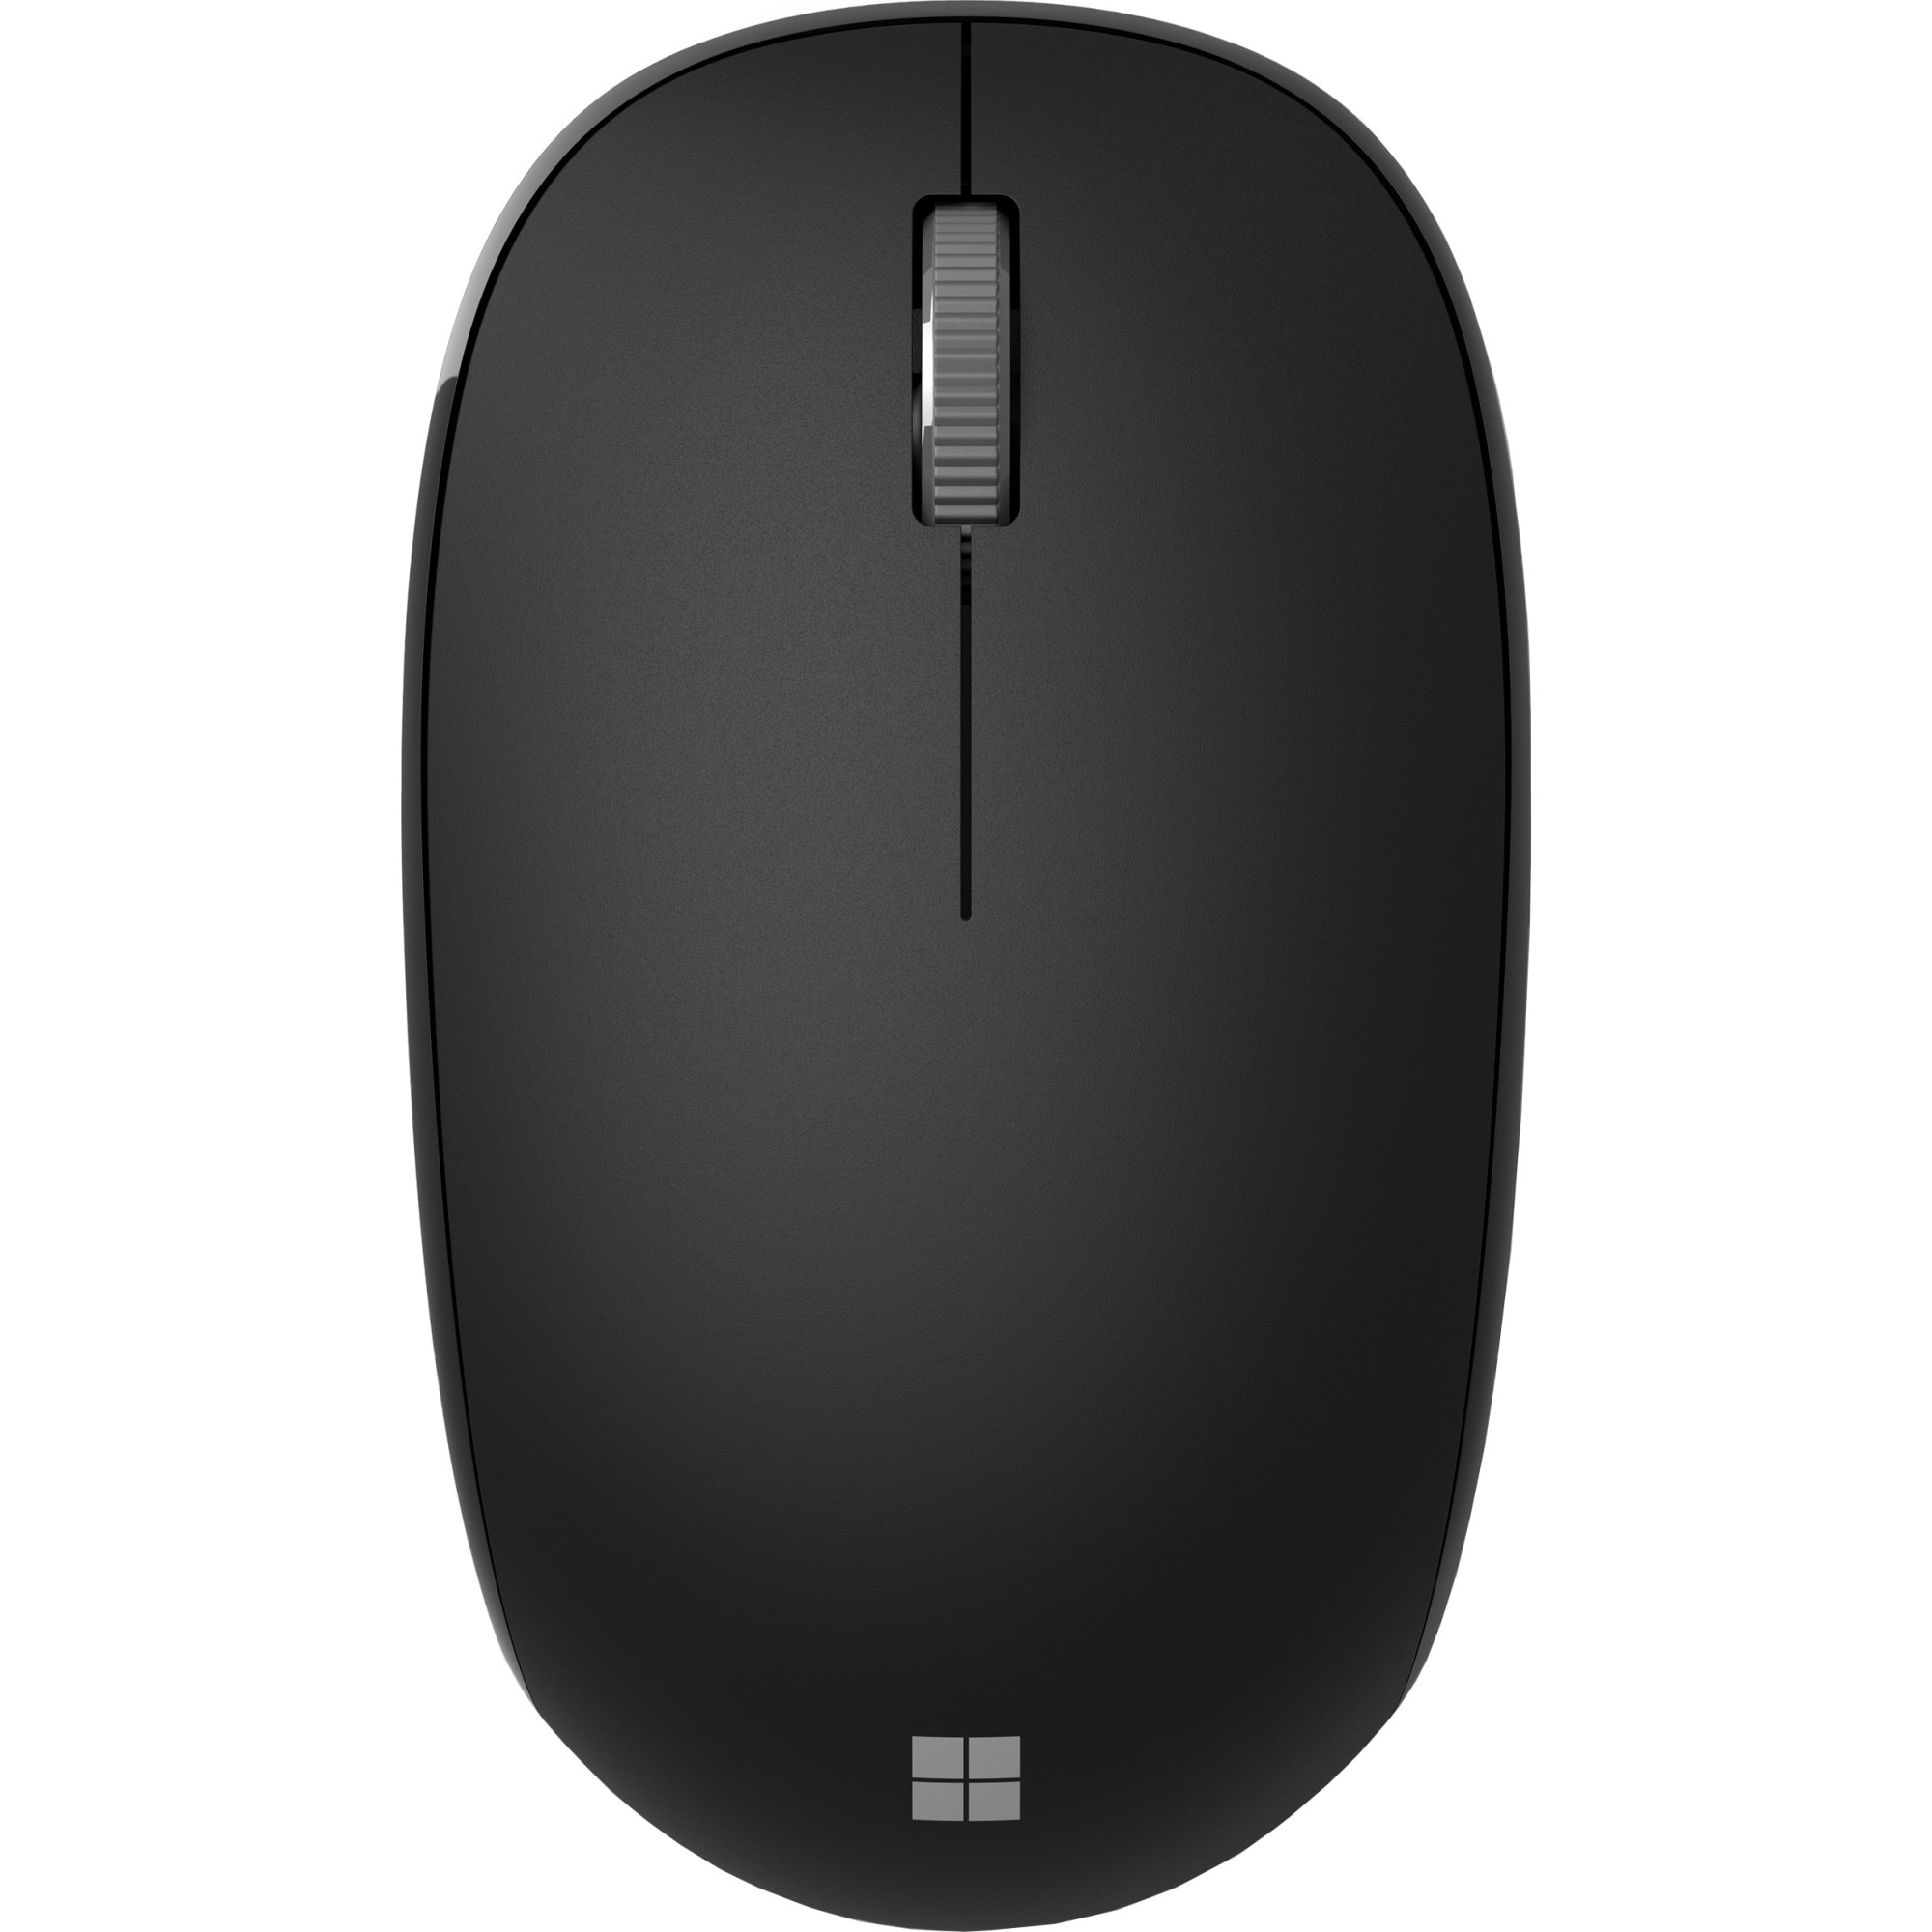 Fotografie Mouse bluetooth Microsoft, Negru - for business